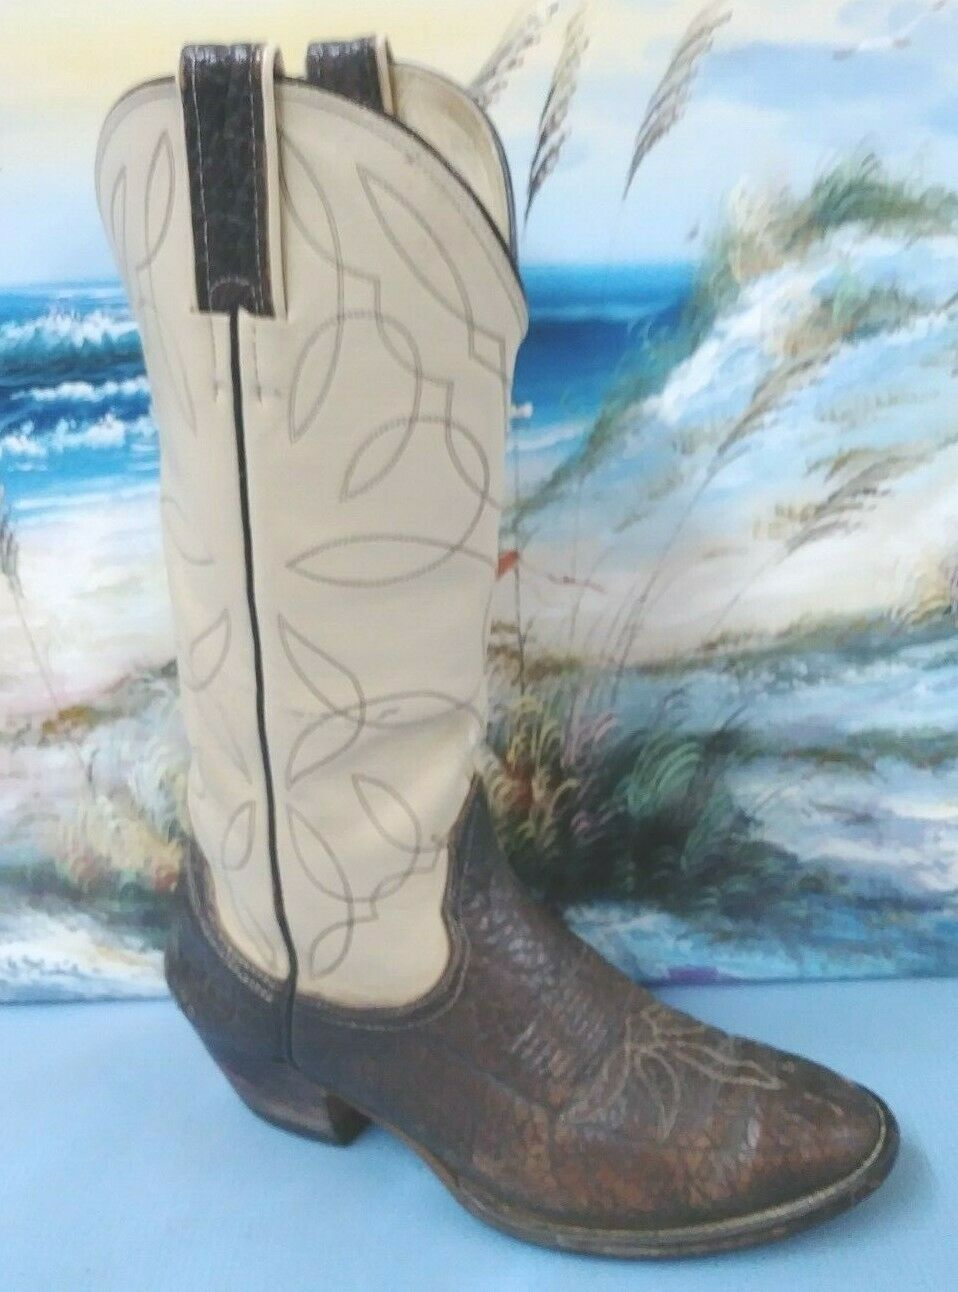 Sheneoah donna Diuominiione 8 D Marronee western cowbot stivali   3008